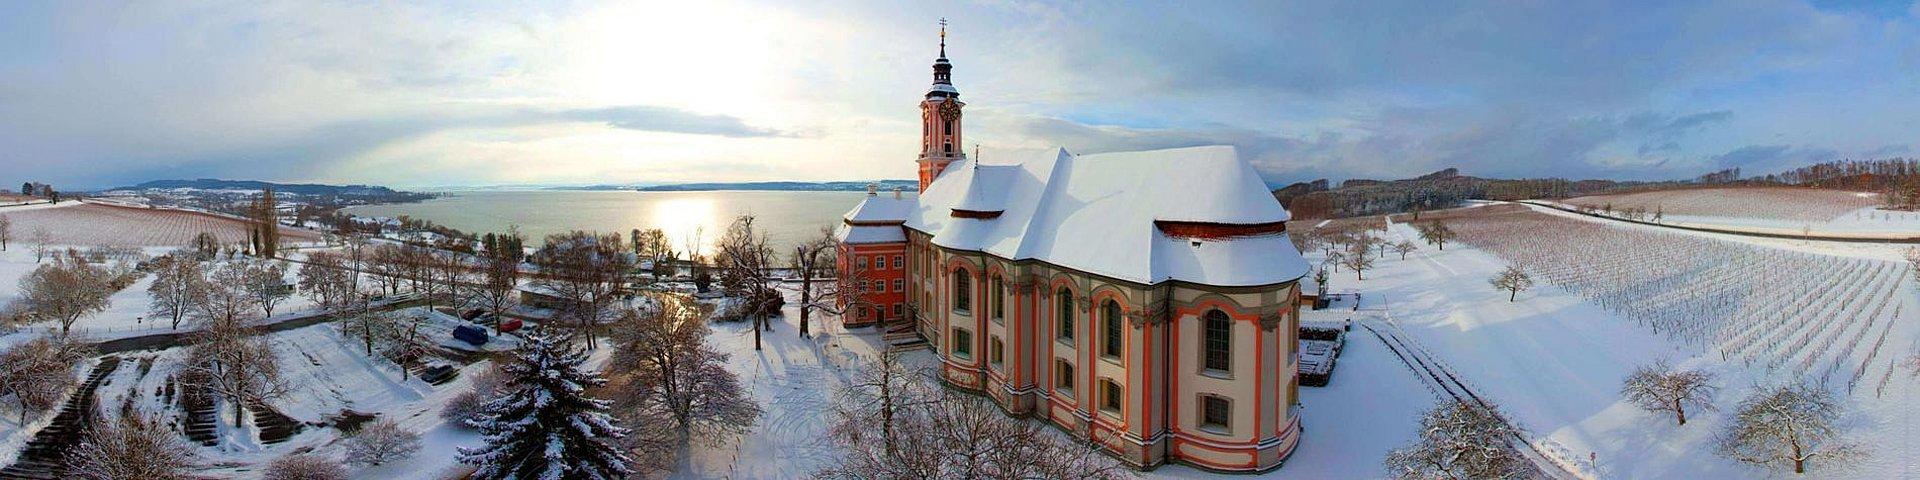 Winter Am Bodensee Bodenseeferien De